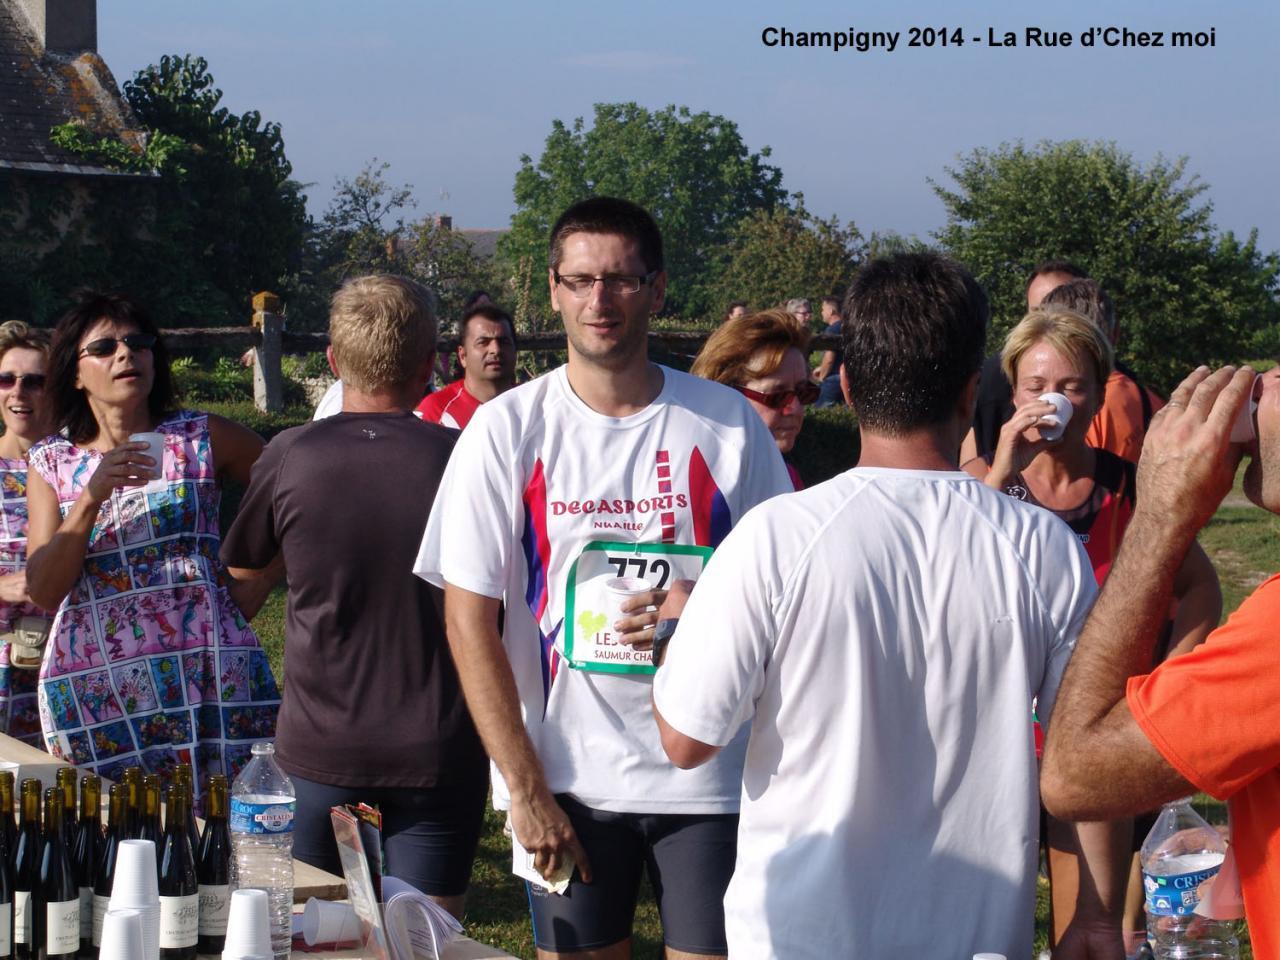 Champigny 2014 - Rue d'Chez Moi (24)